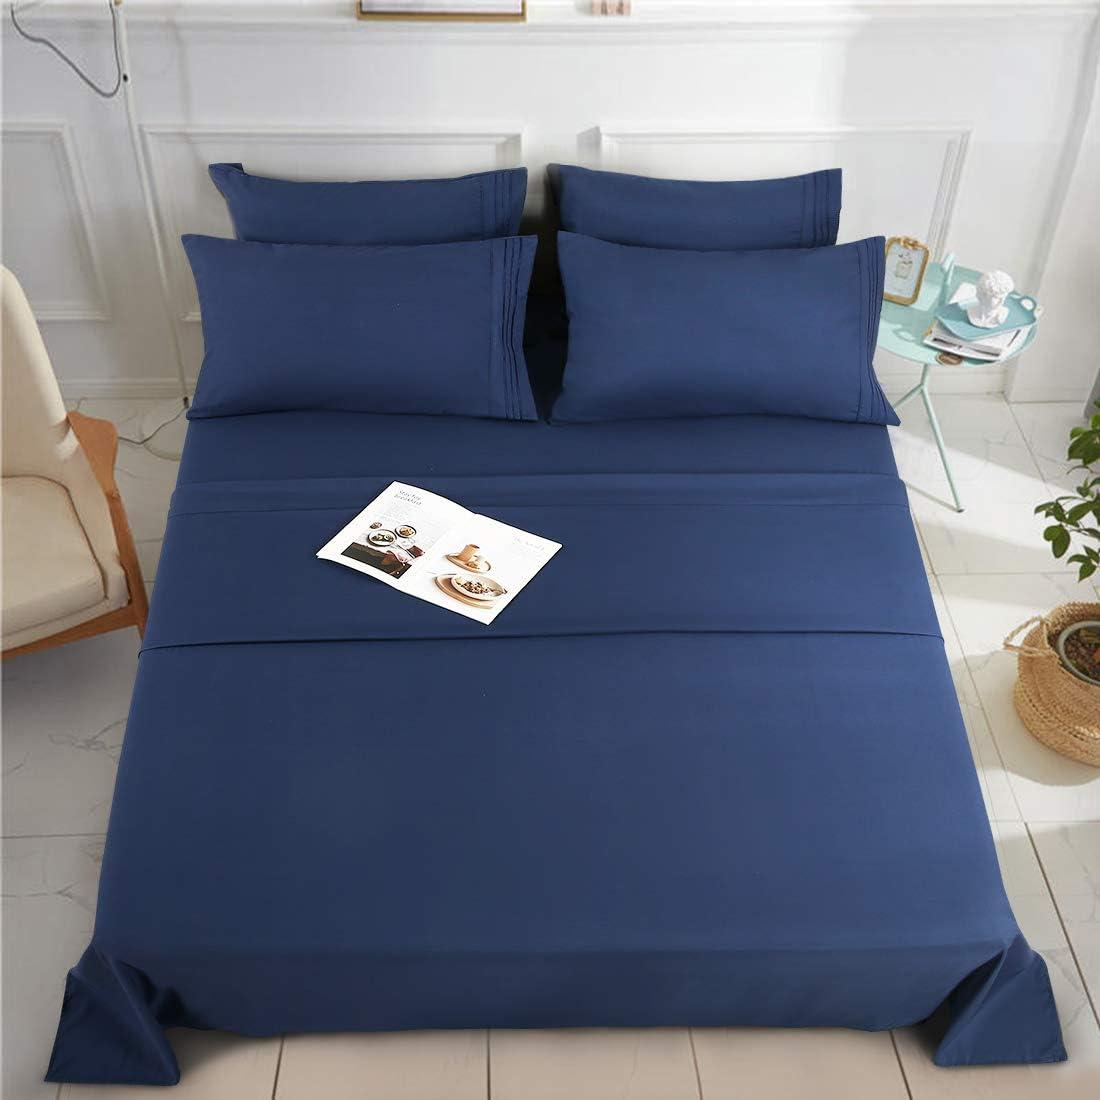 KARRISM King Size 6 Piece Bed Sheets Set Extra Soft & Breathable Brushed 1800 Series Microfiber, Wrinkle & Fade Resistant, Comfortable Deep Pocket Bedding Set, Navy Blue